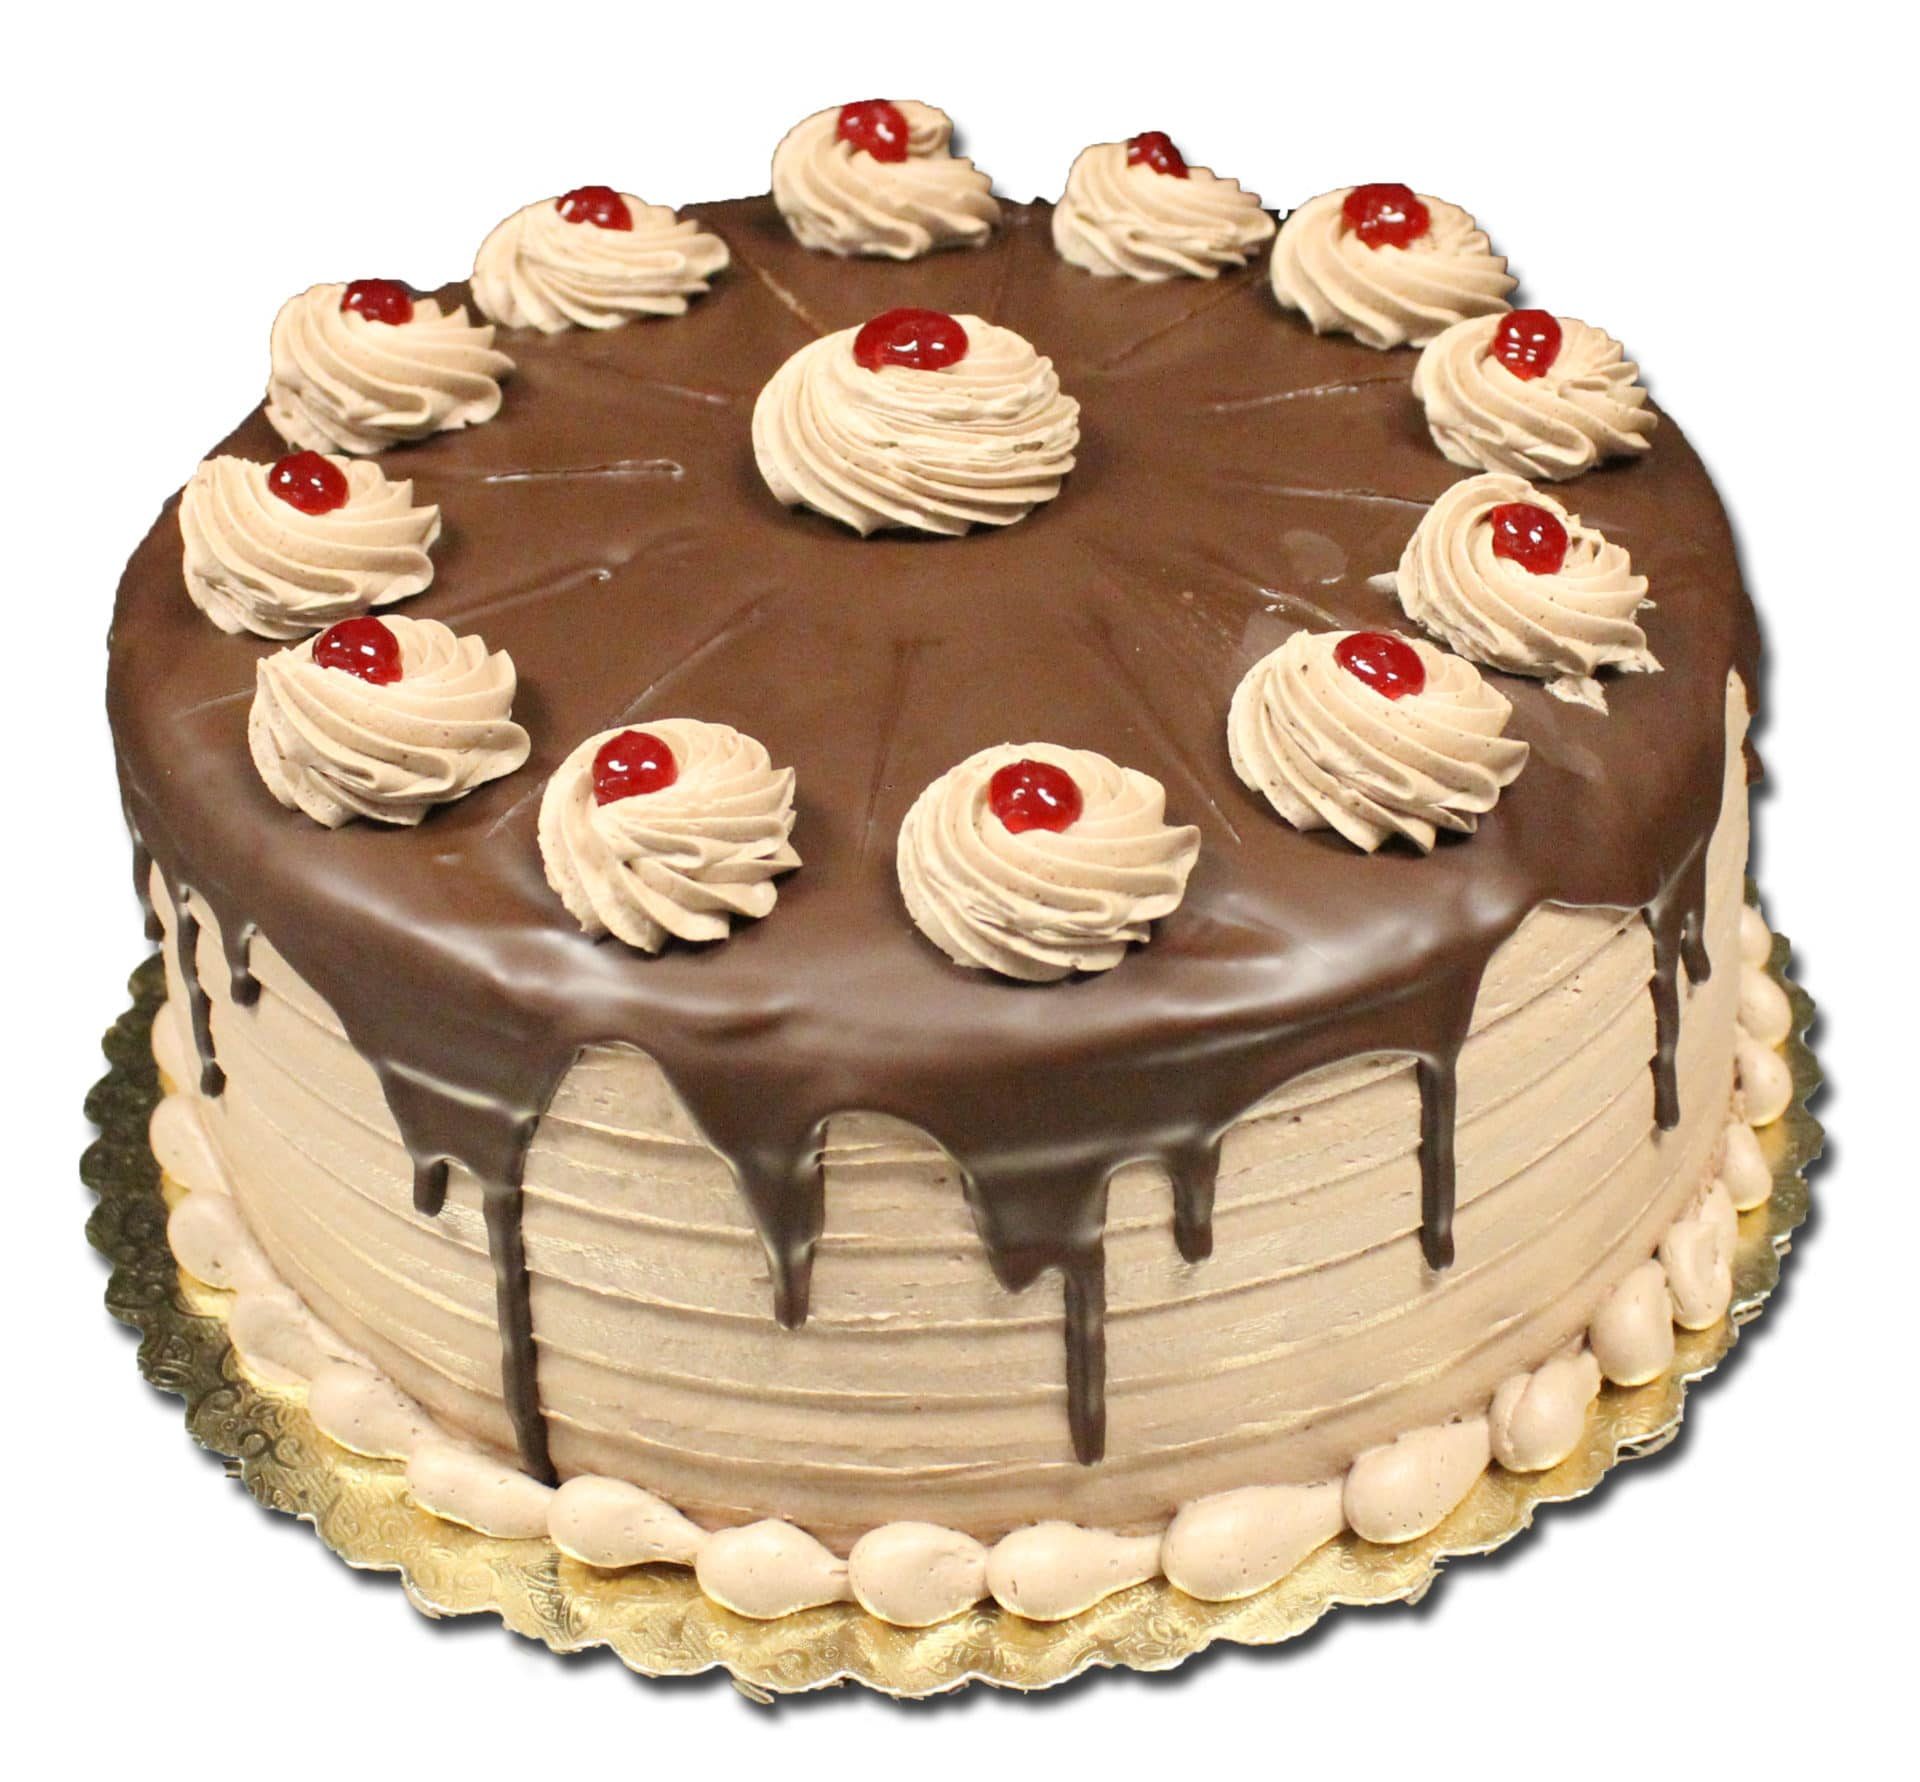 Aggies Chocolate Raspberry Torte  Aggies Bakery  Cake Shop